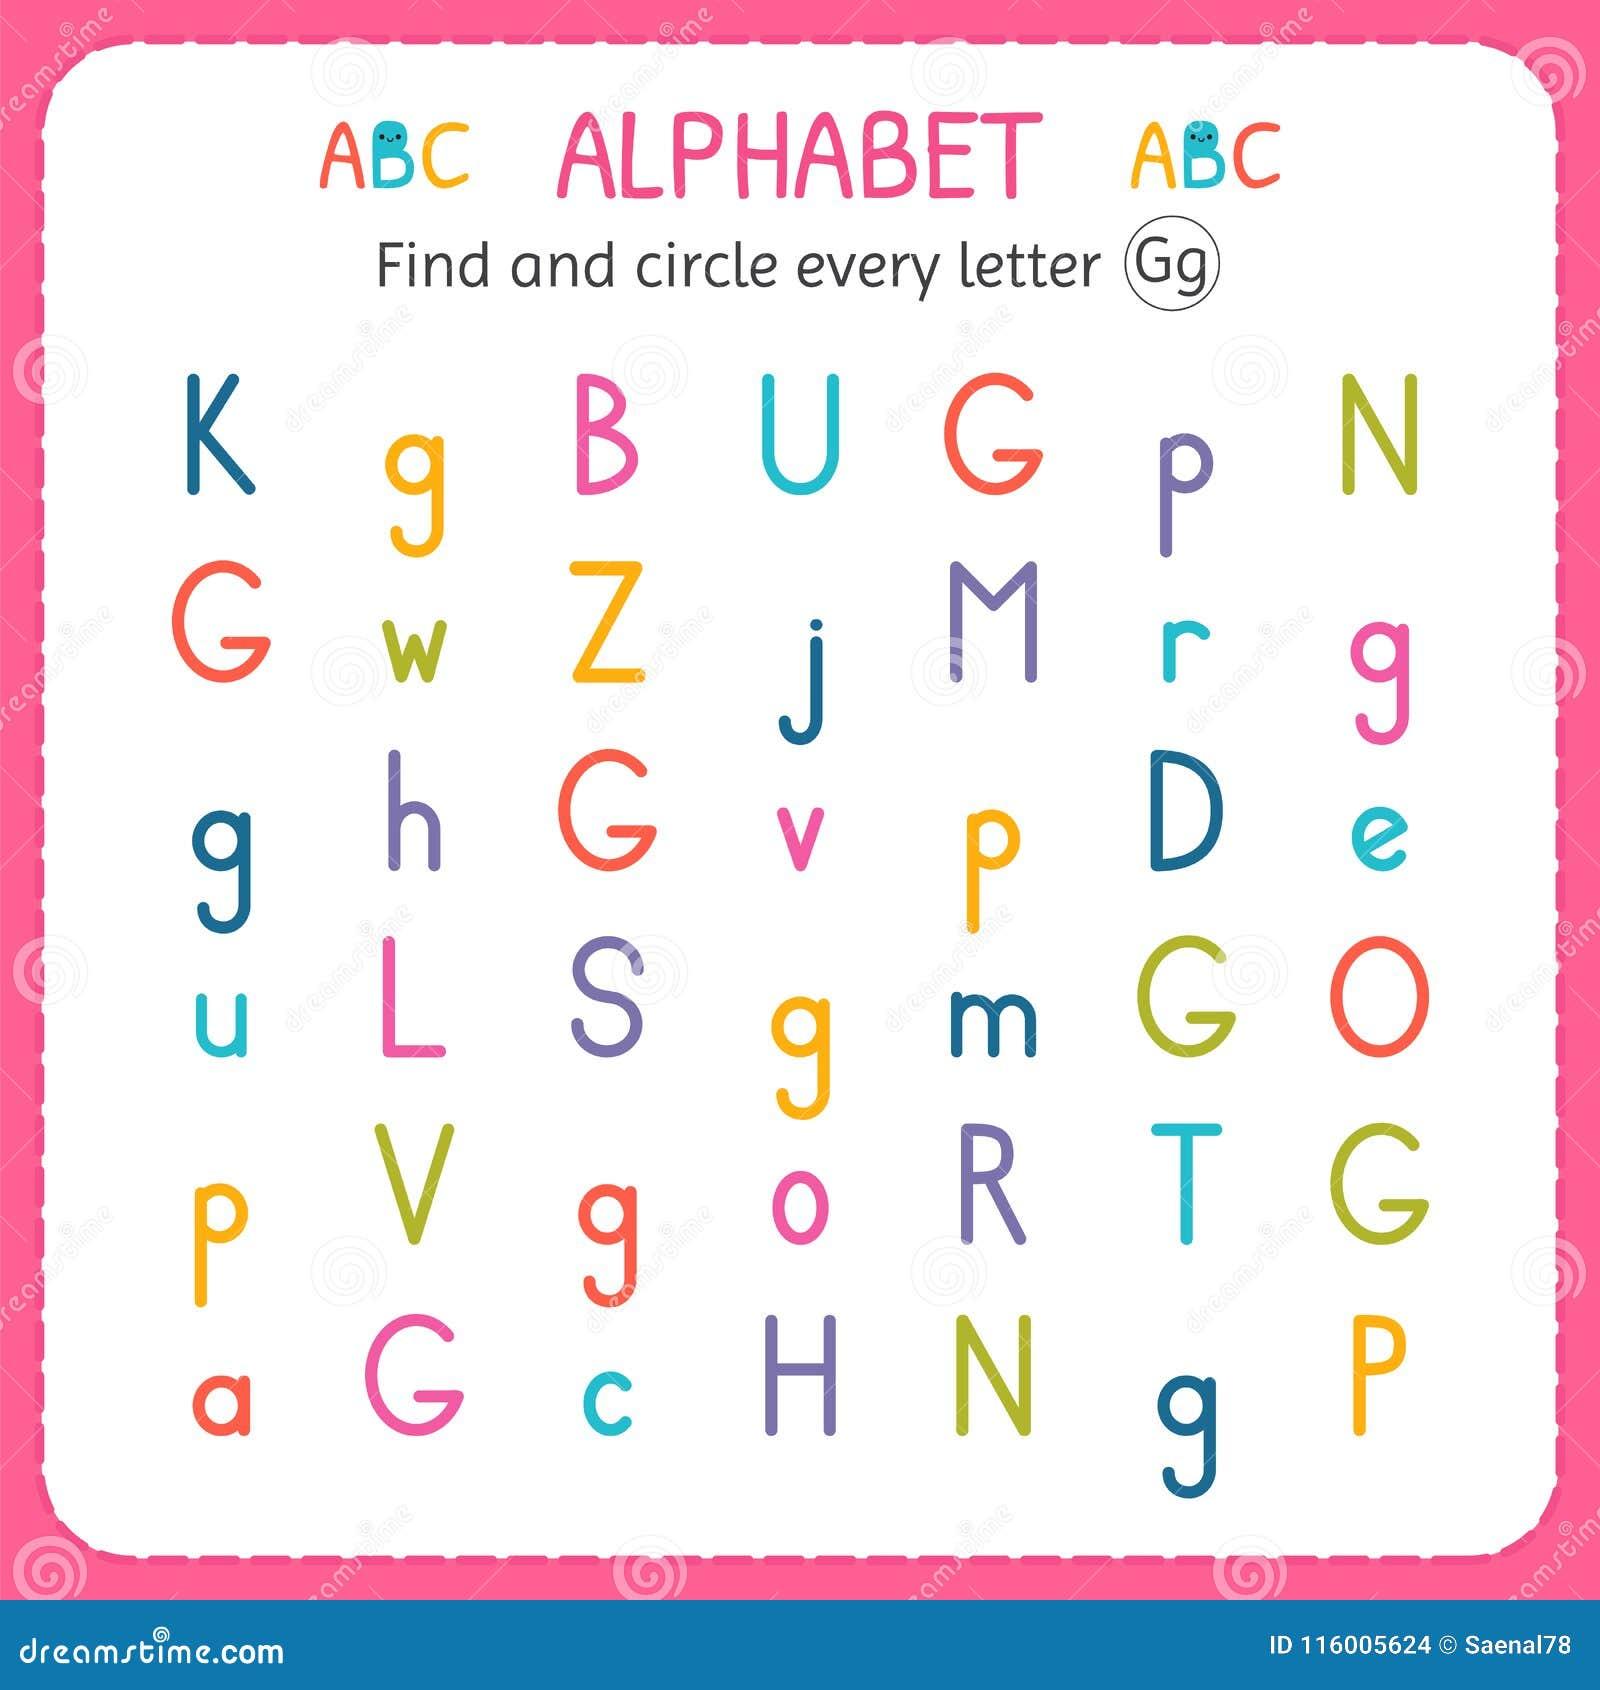 find and circle every letter g worksheet for kindergarten and preschool exercises for children. Black Bedroom Furniture Sets. Home Design Ideas